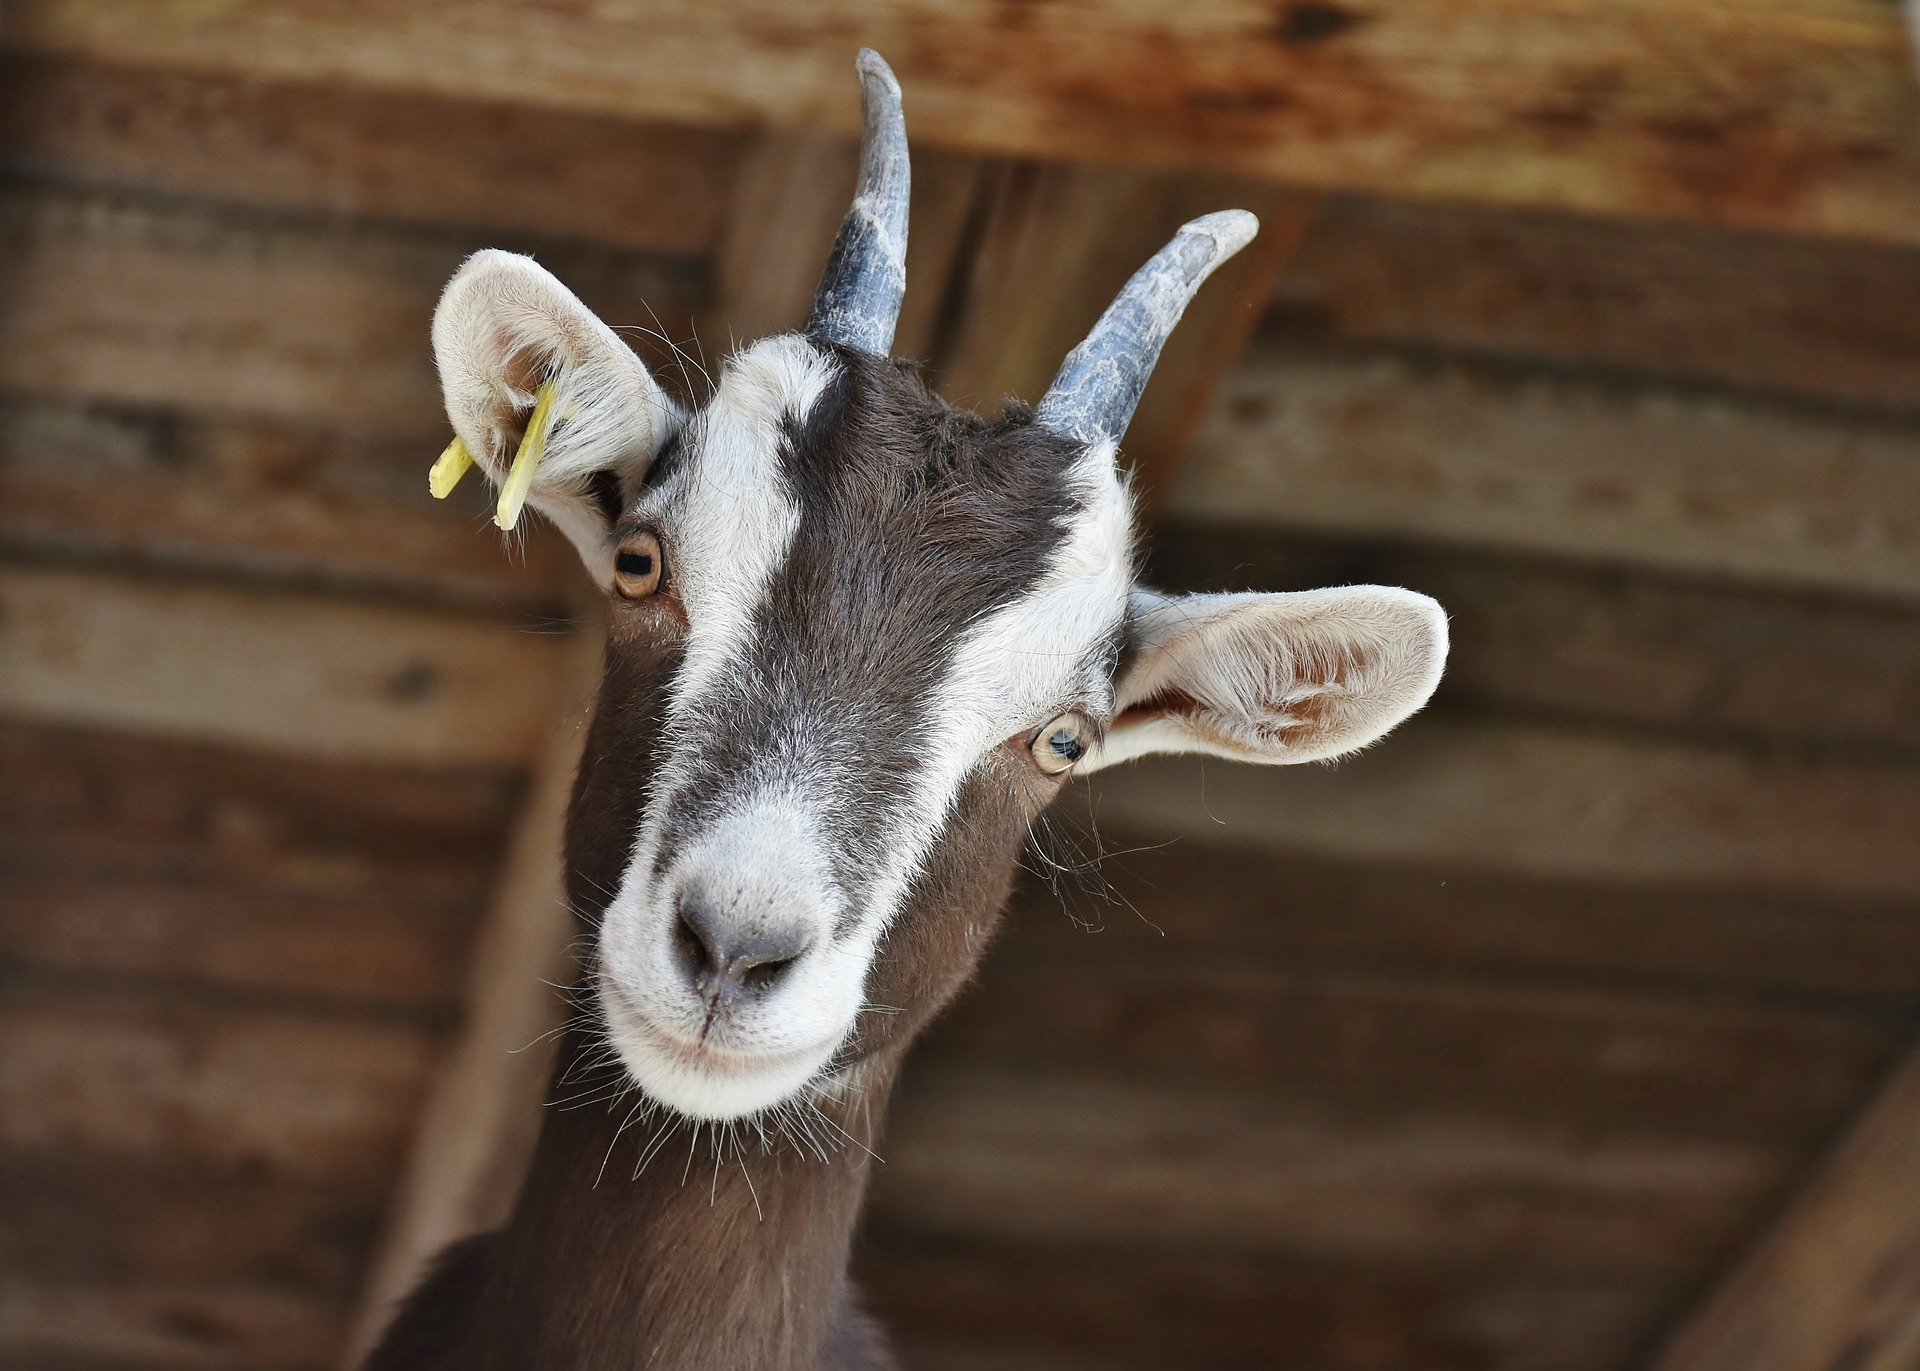 Animaux ferme chèvre